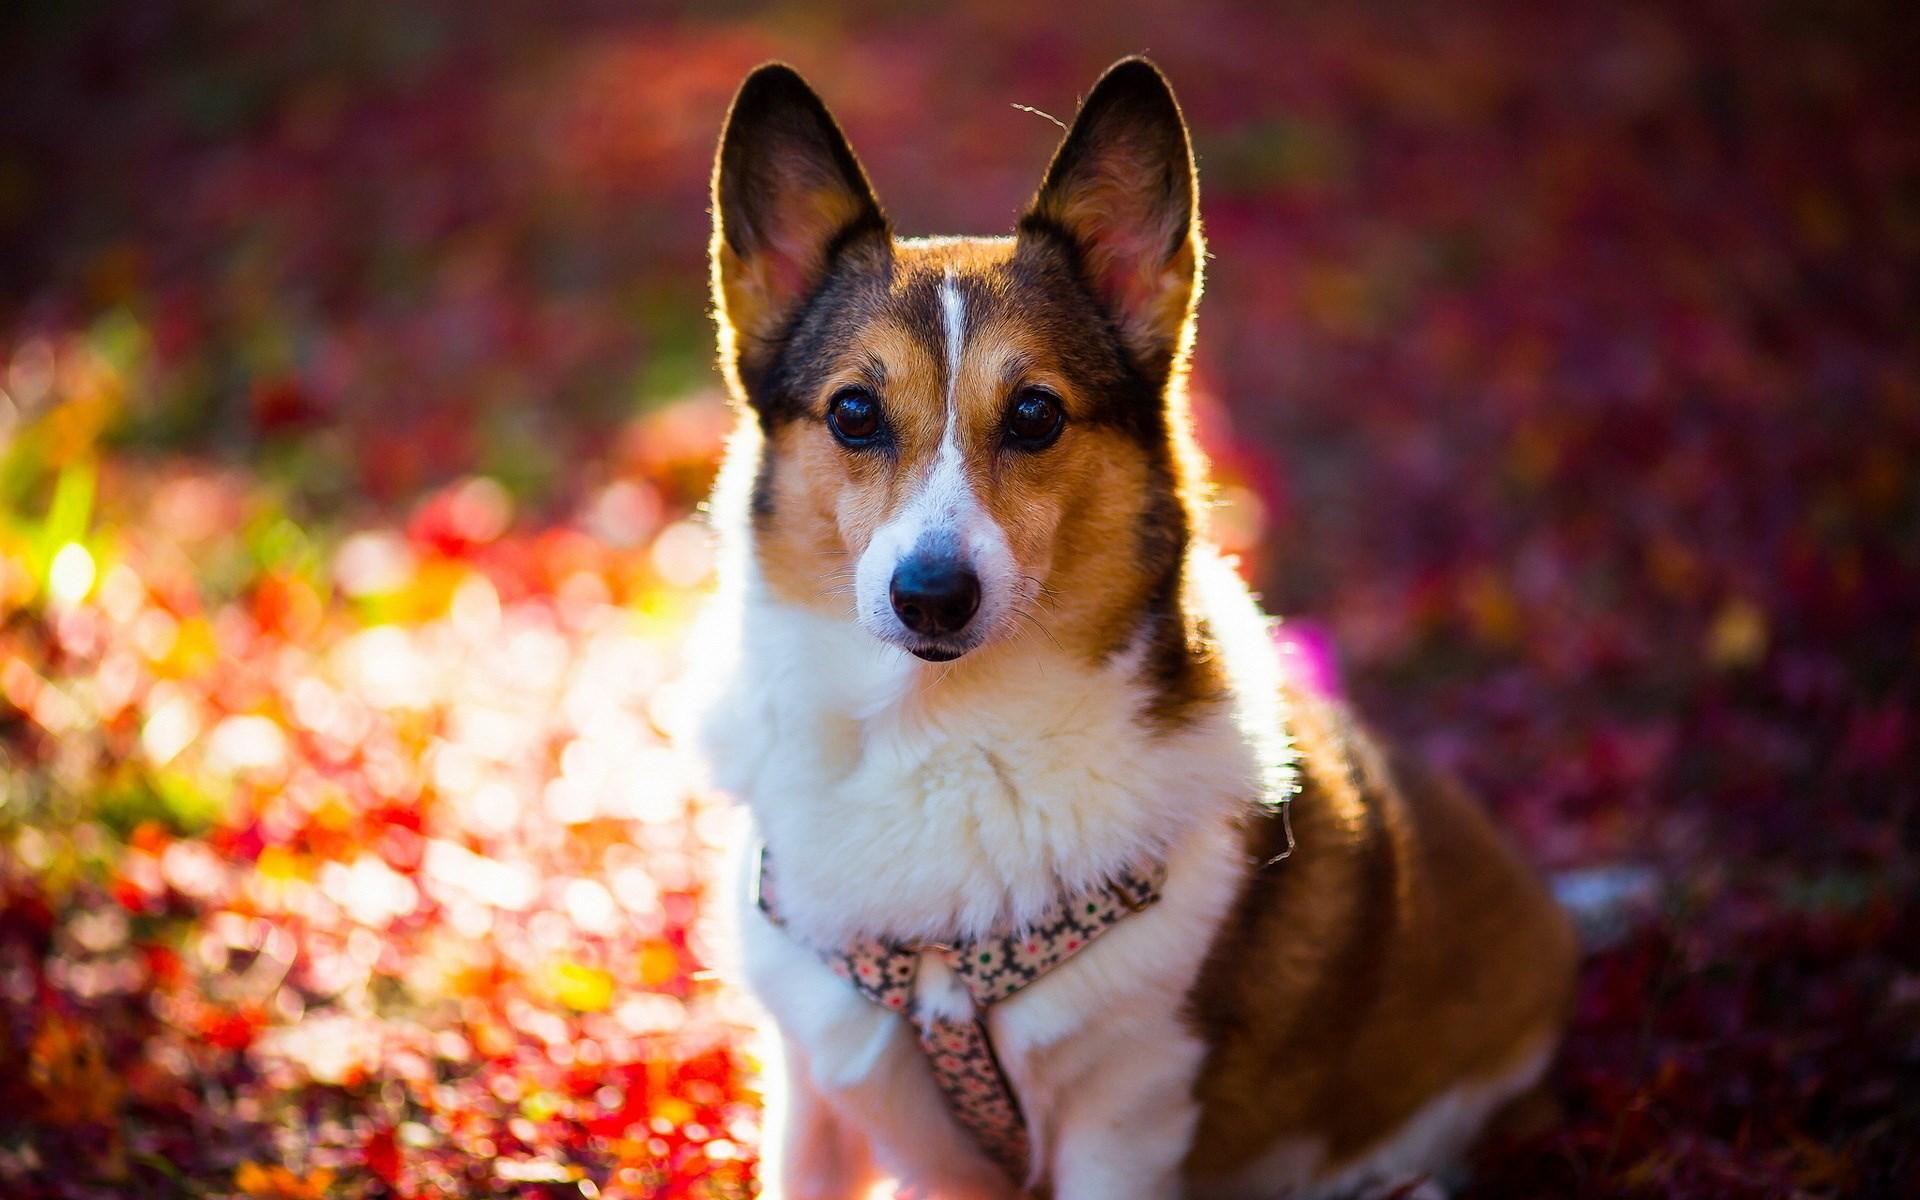 Cute Dog Close-Up